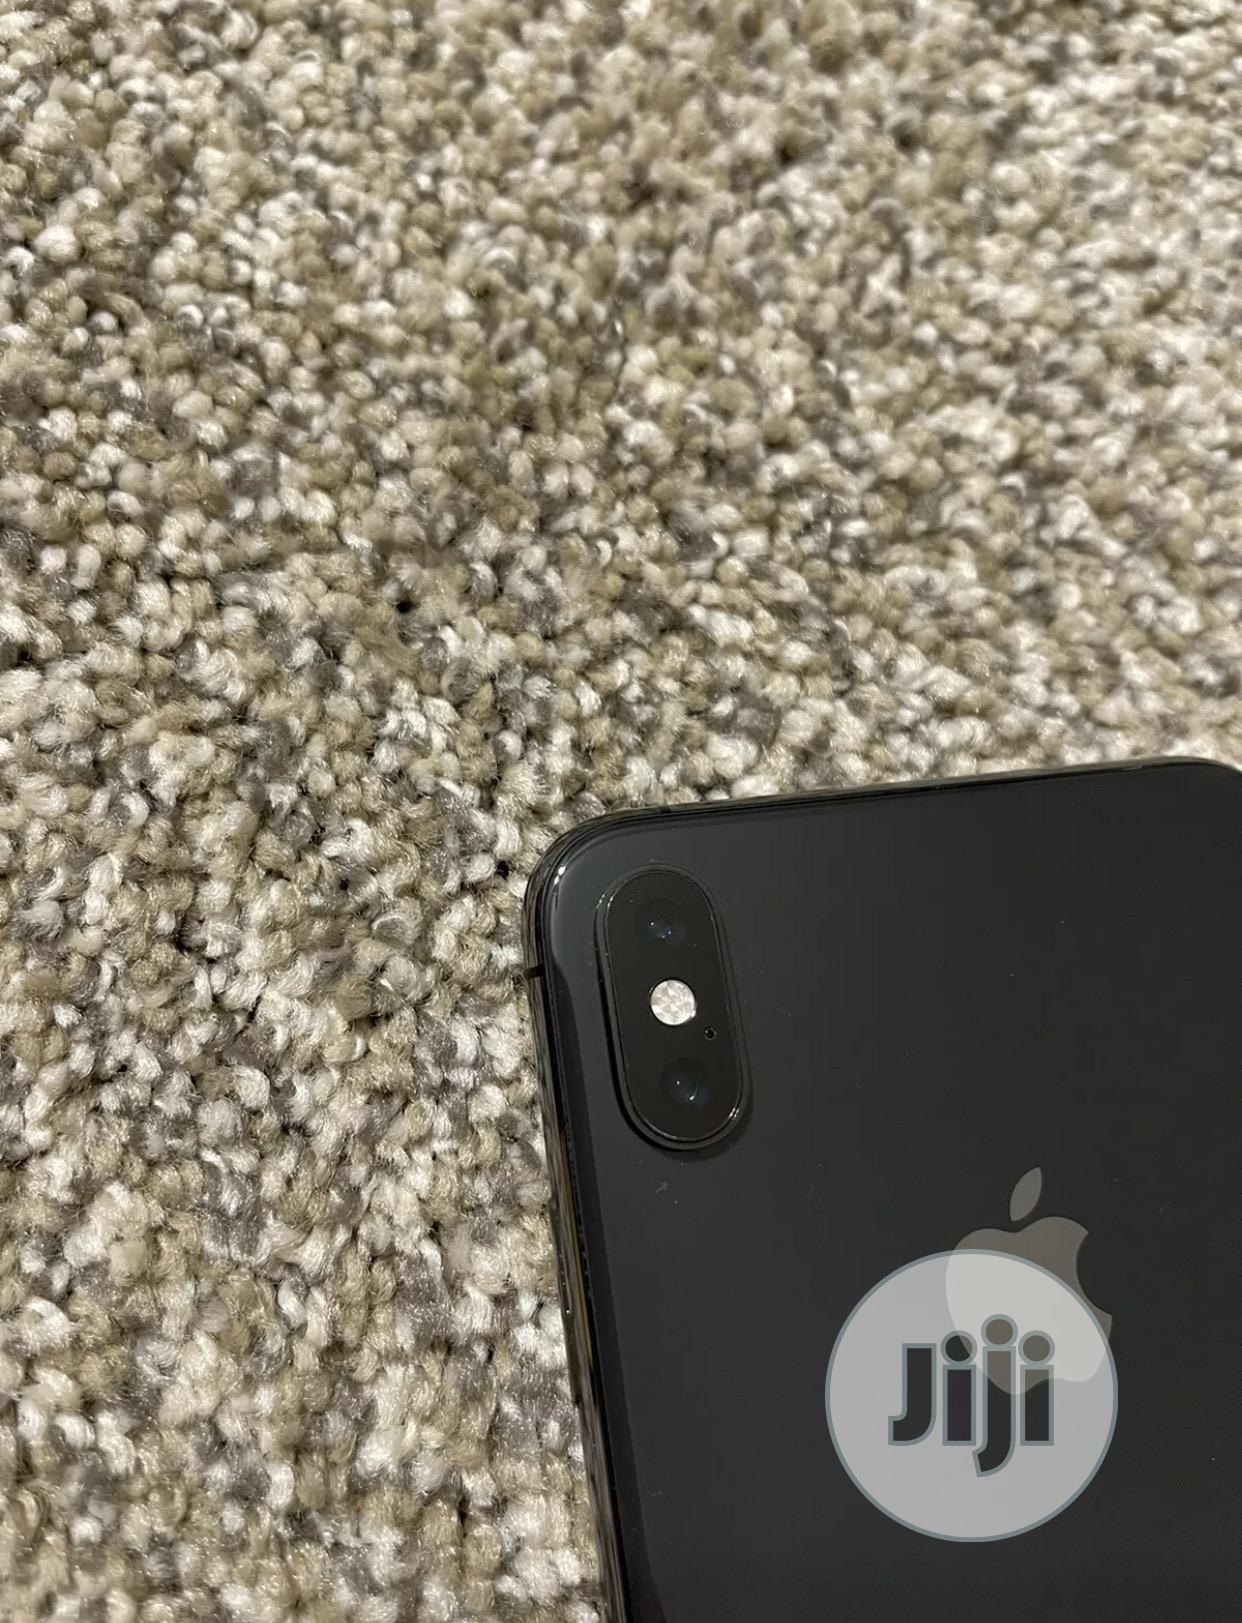 Apple iPhone XS Max 64 GB Black | Mobile Phones for sale in Ifako-Ijaiye, Lagos State, Nigeria